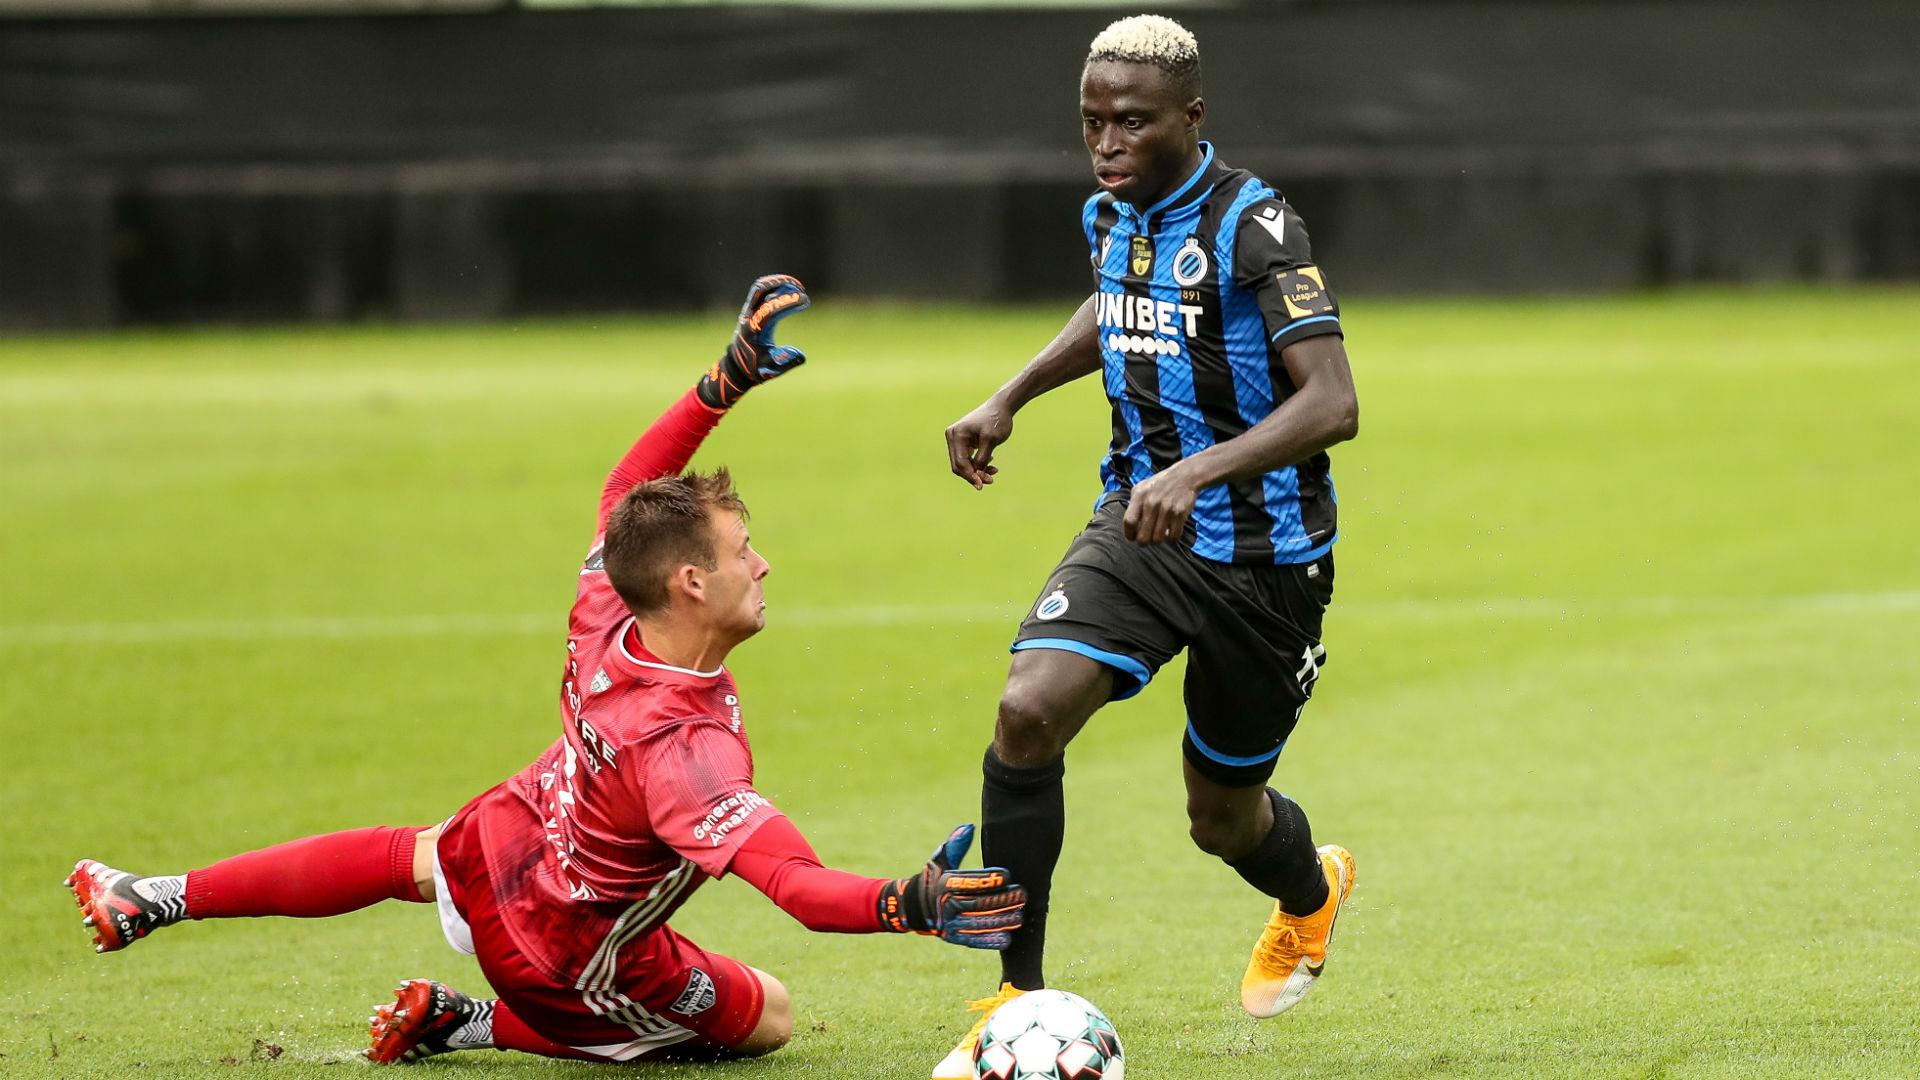 Krepin Diatta: Monaco complete signing of Club Brugge forward